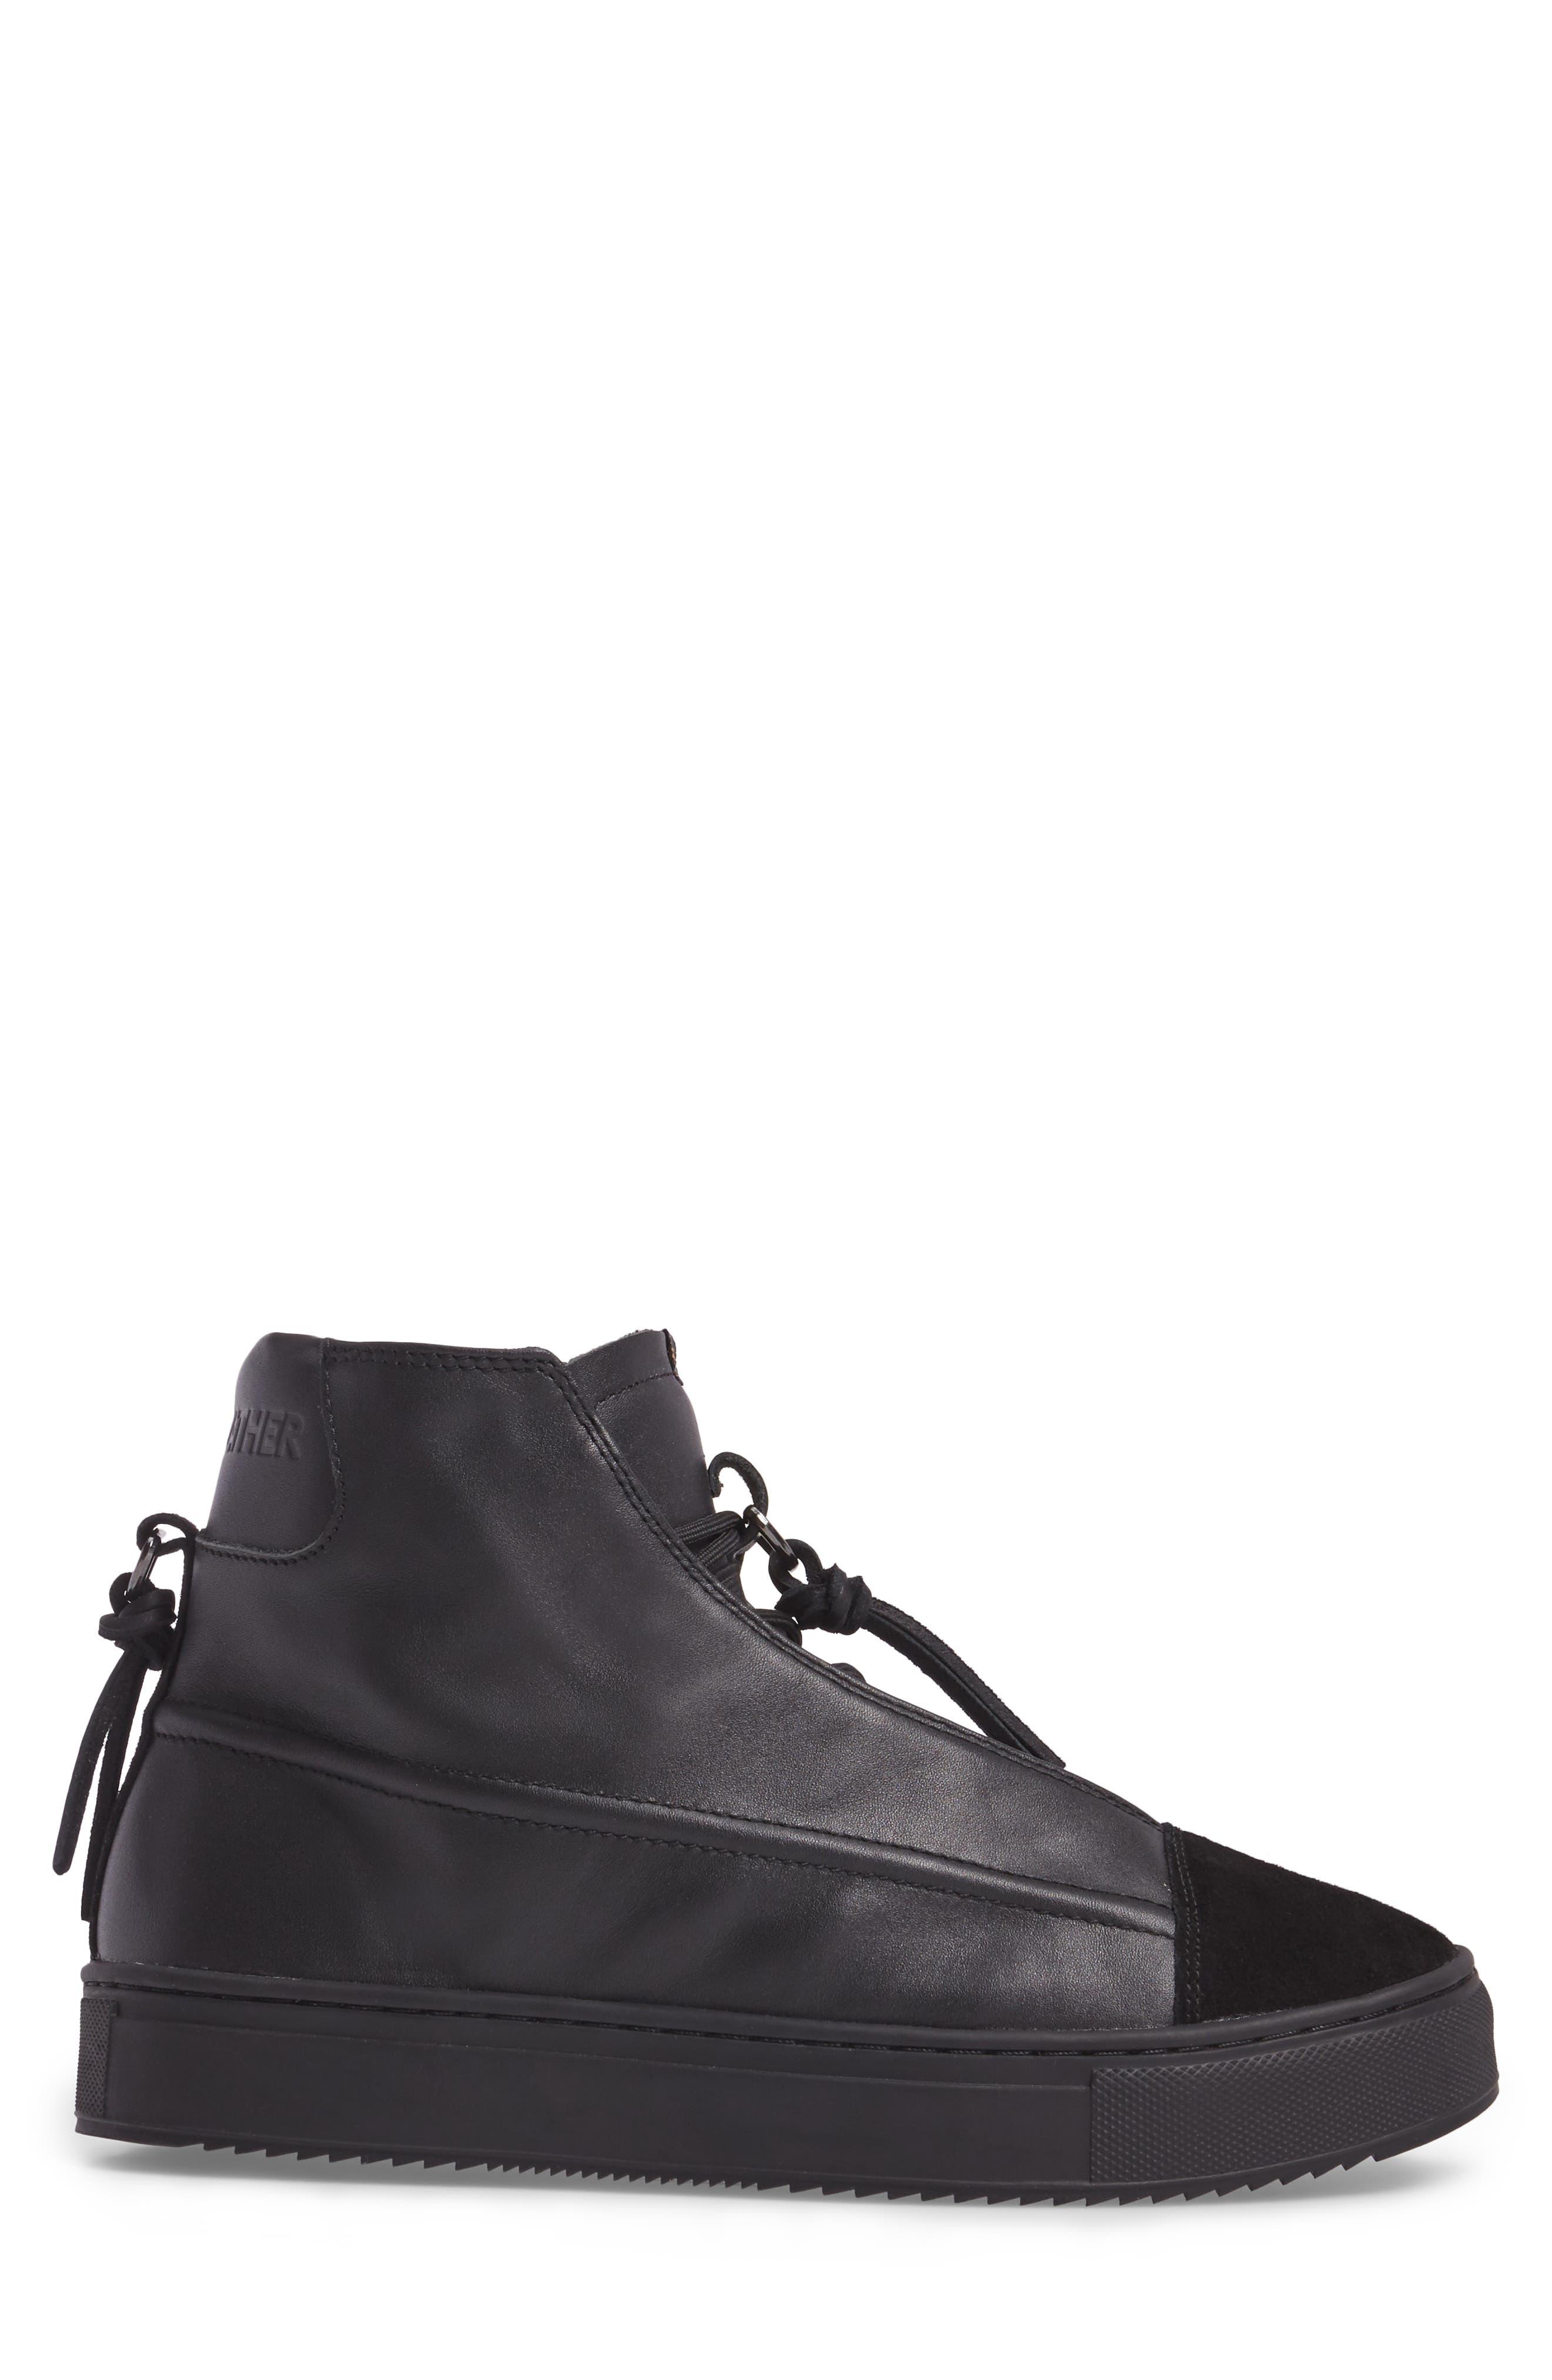 Sidney High Top Sneaker,                             Alternate thumbnail 3, color,                             001